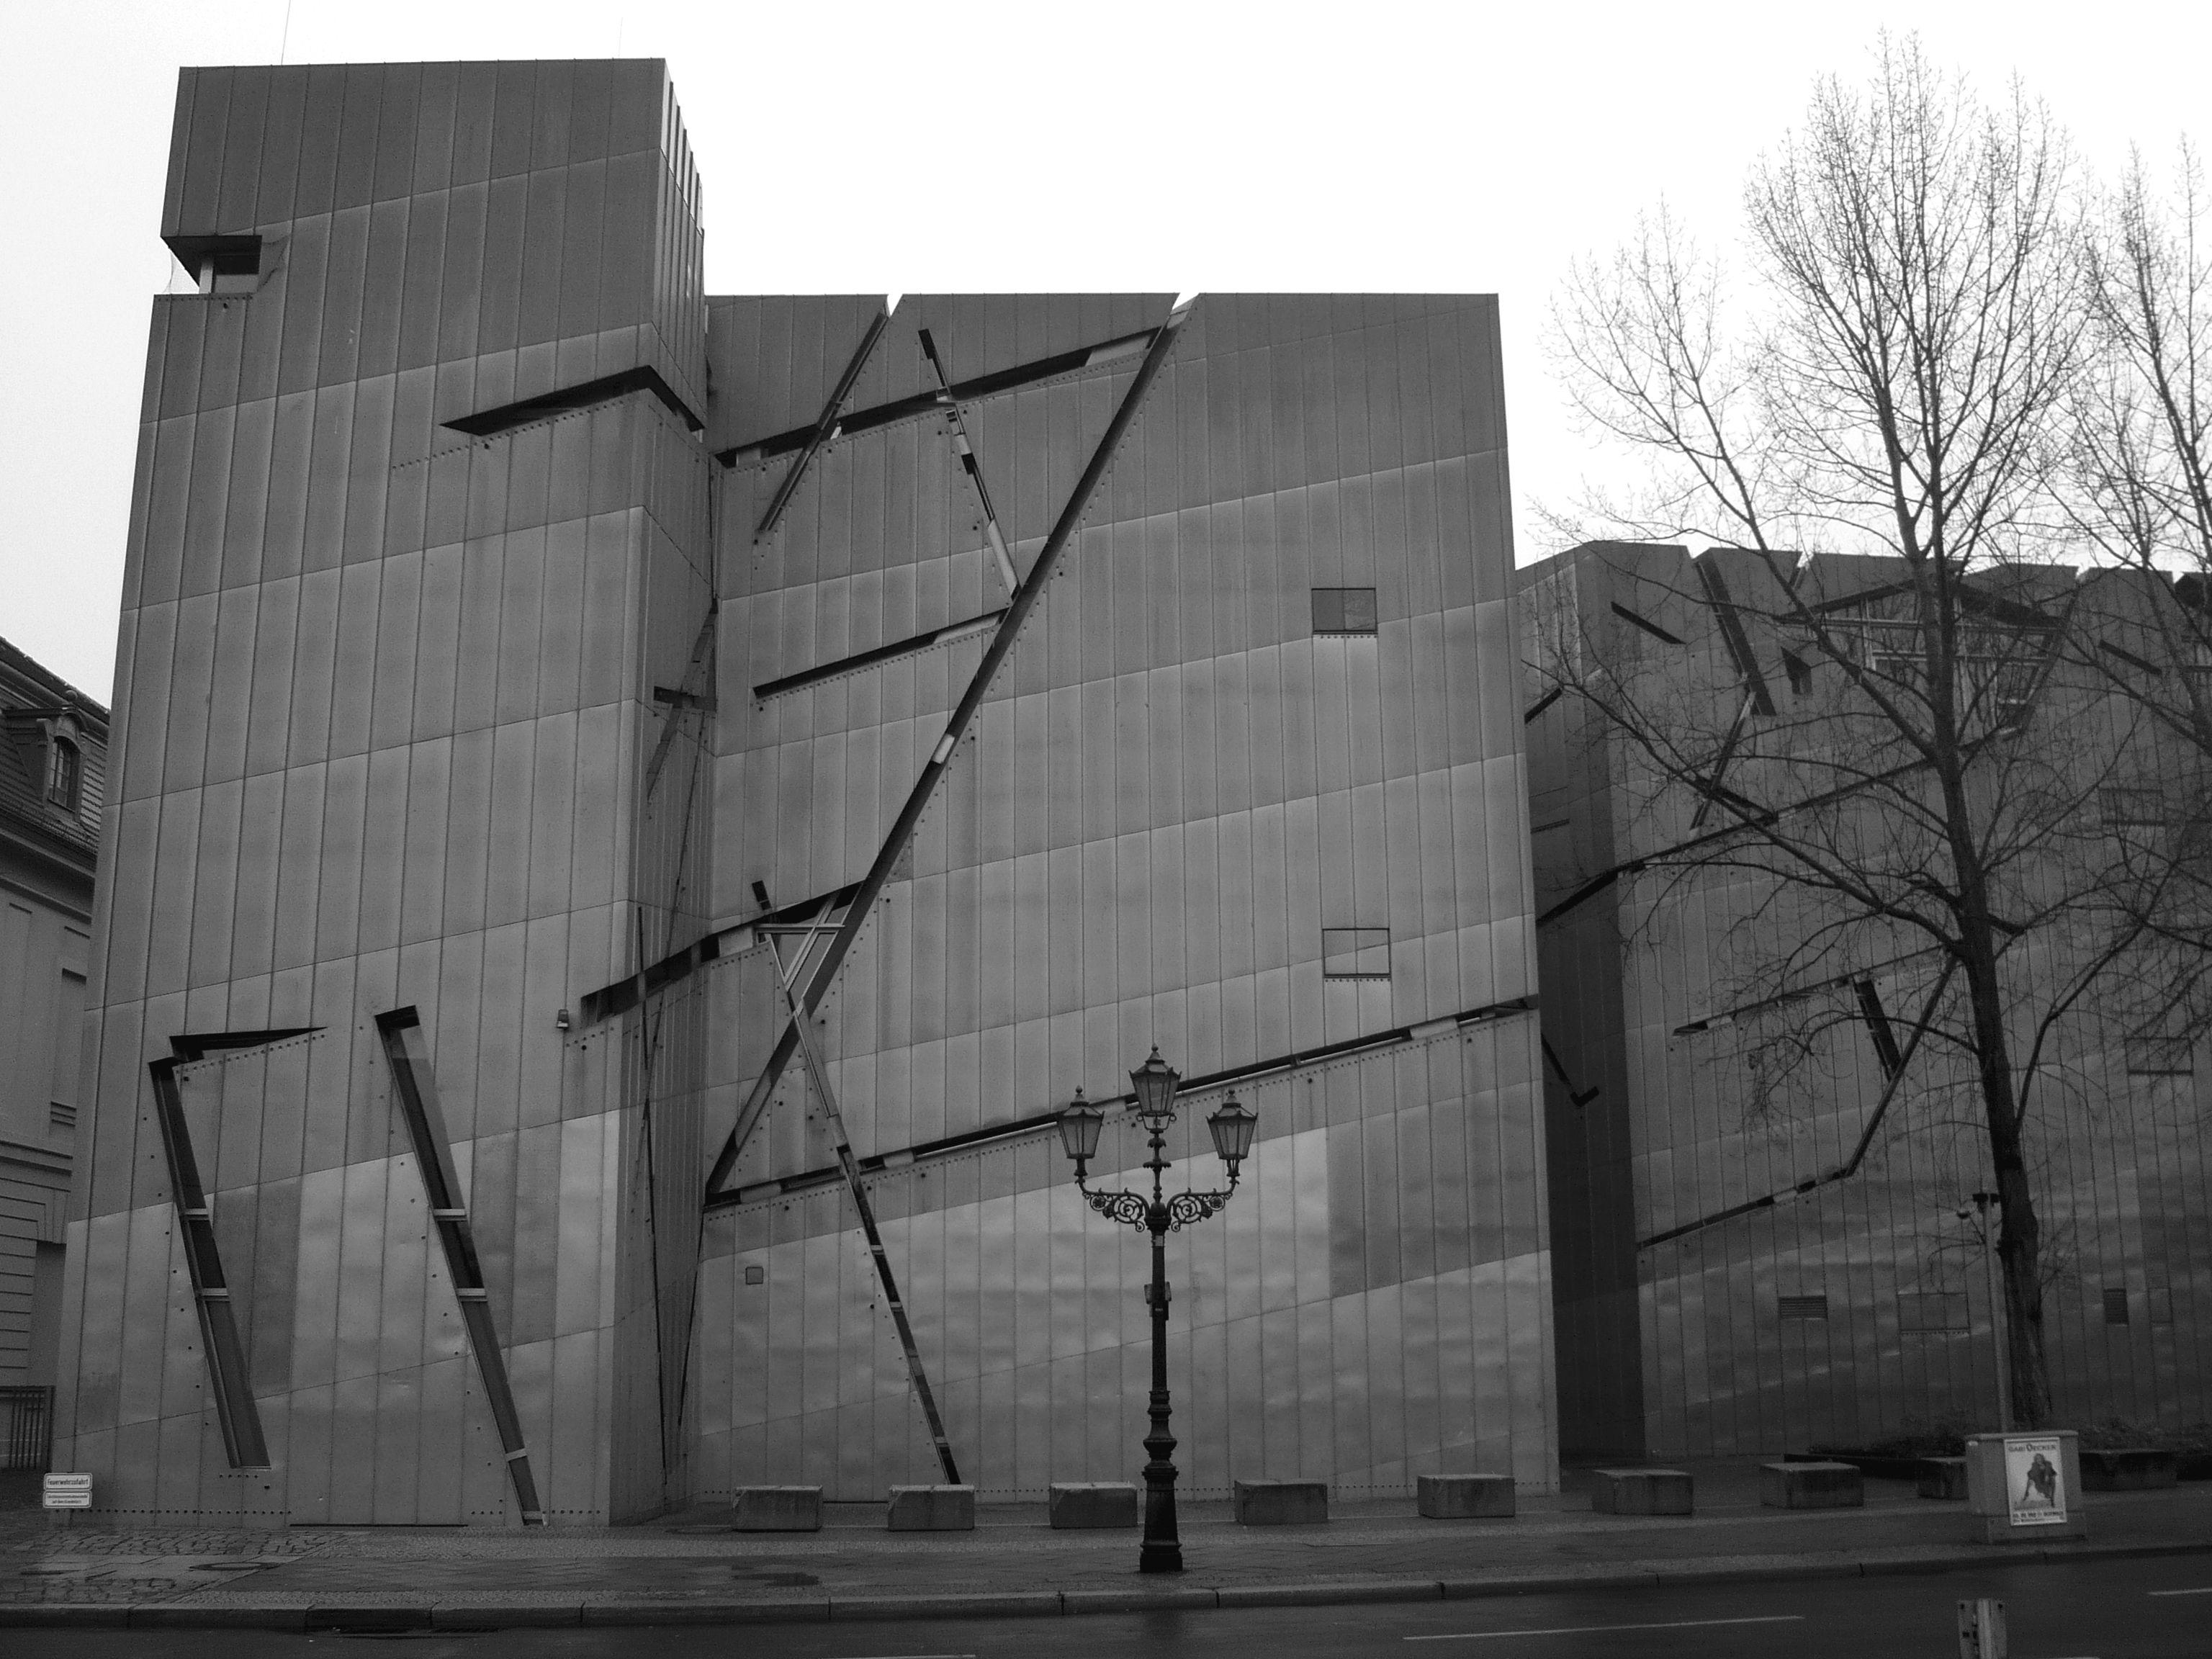 Jewish museum, Daniel Libeskind  In Berlin, Germany